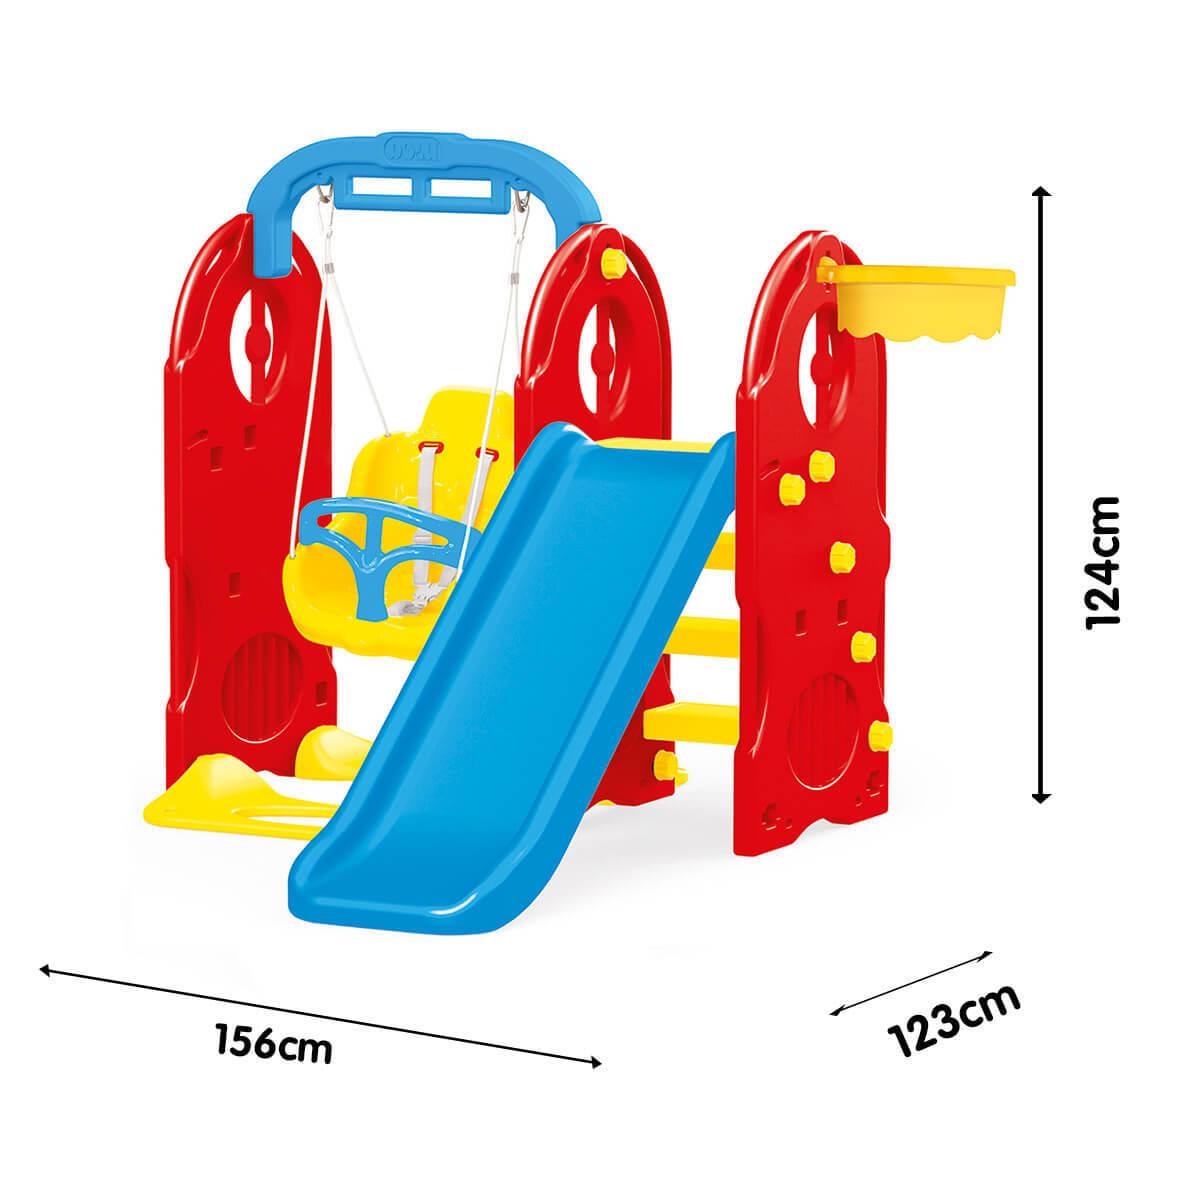 Dolu 4-in-1 Playground (H124cm x L156cm x W123cm)